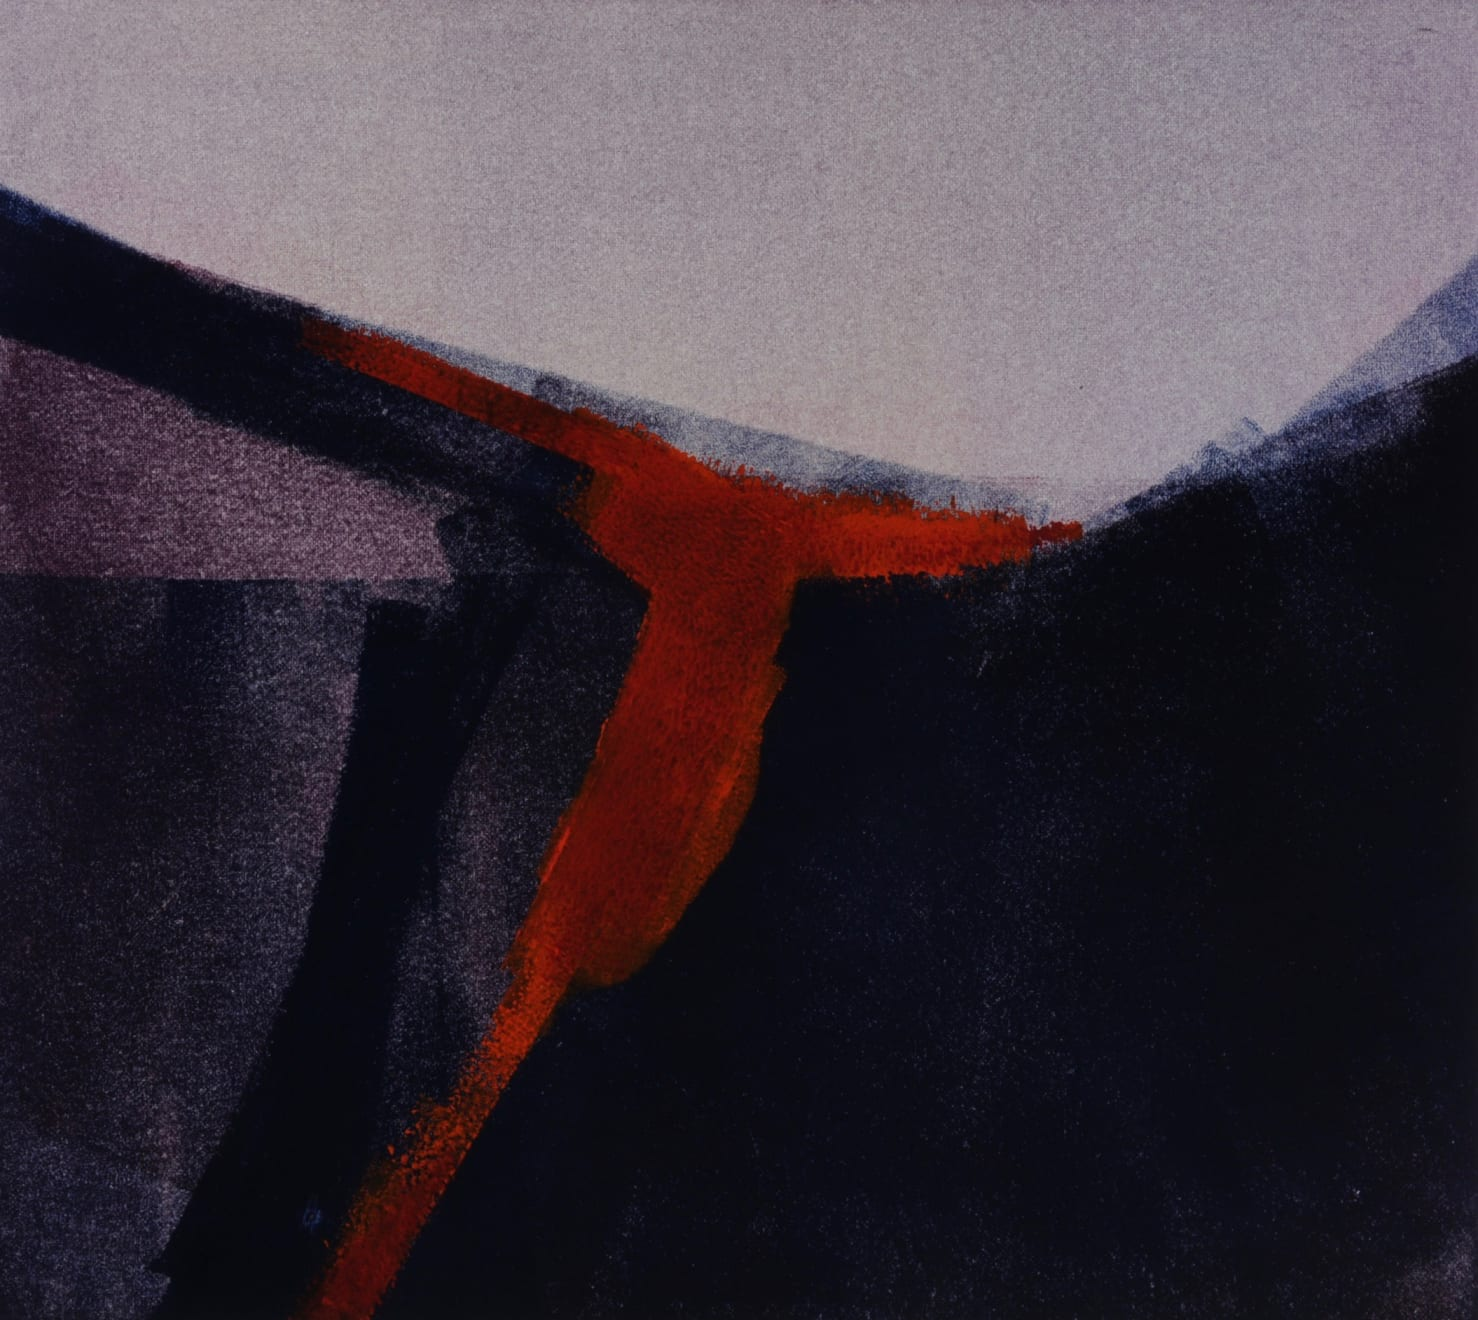 Nigel Swift, Volcano, 2020